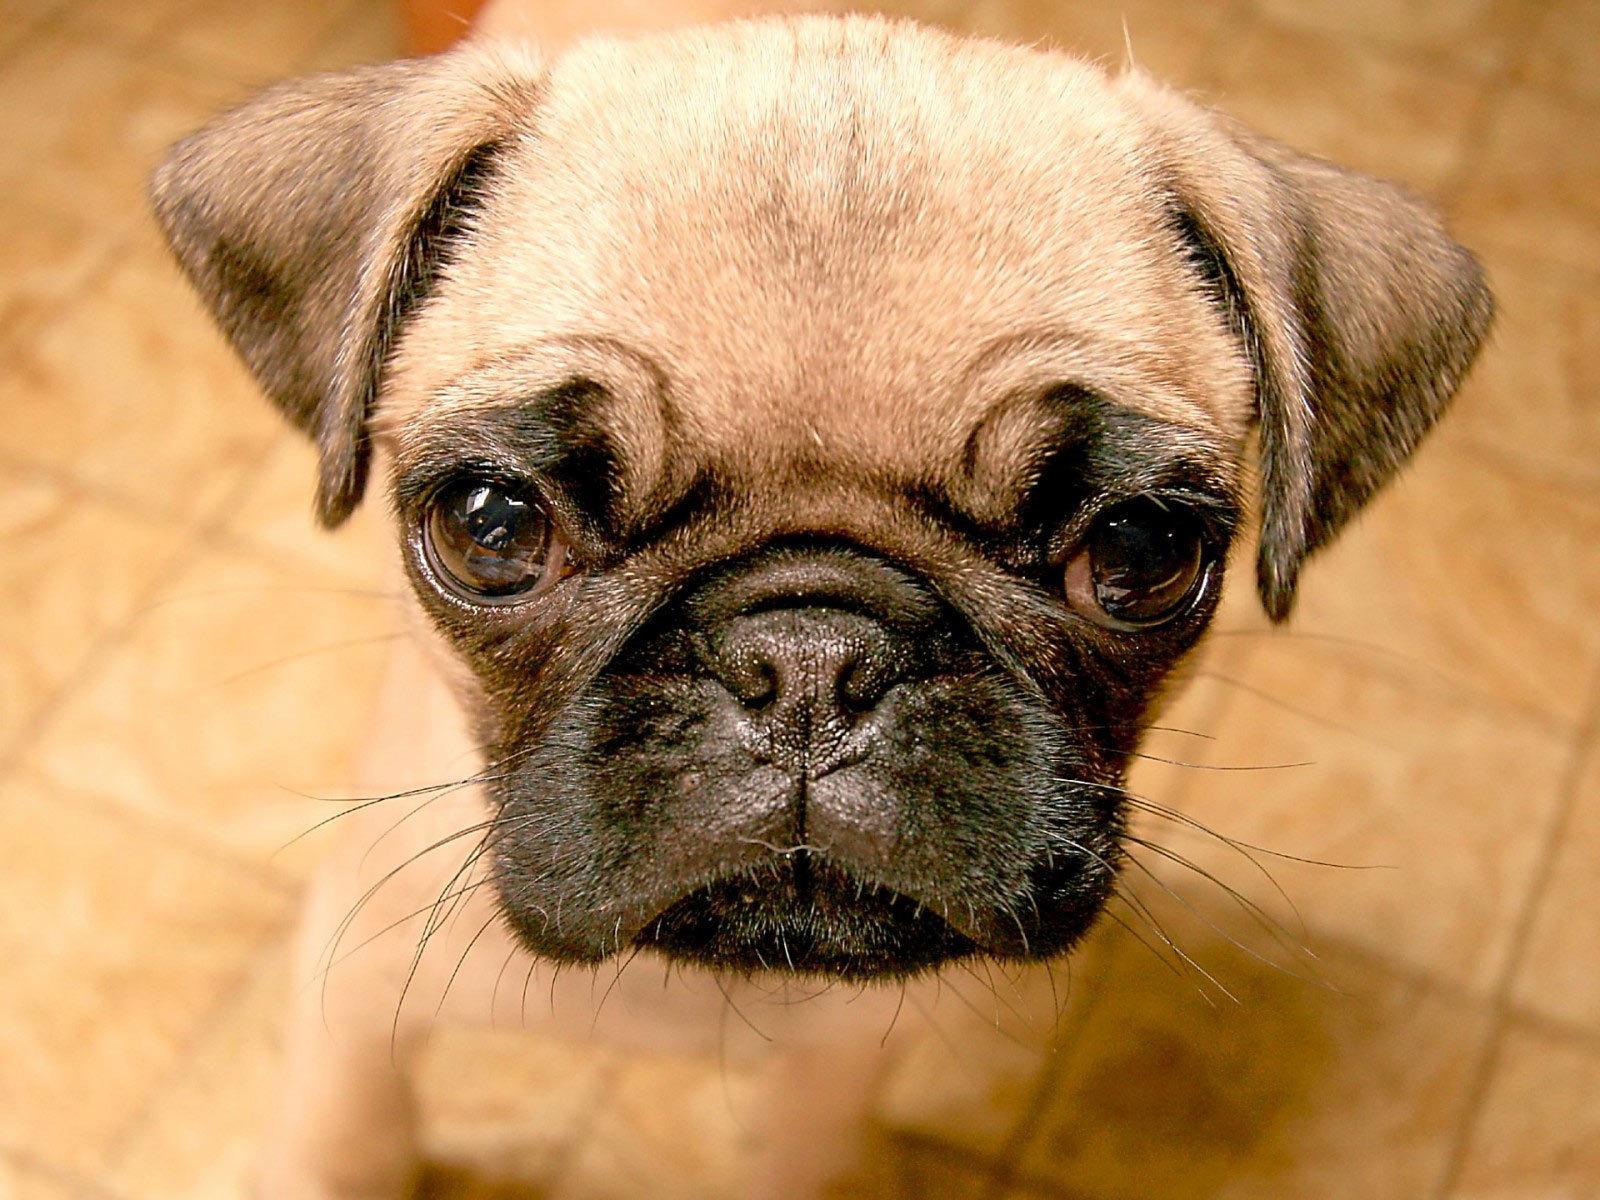 Beautiful Pug   Pugs Wallpaper 13728101 1600x1200